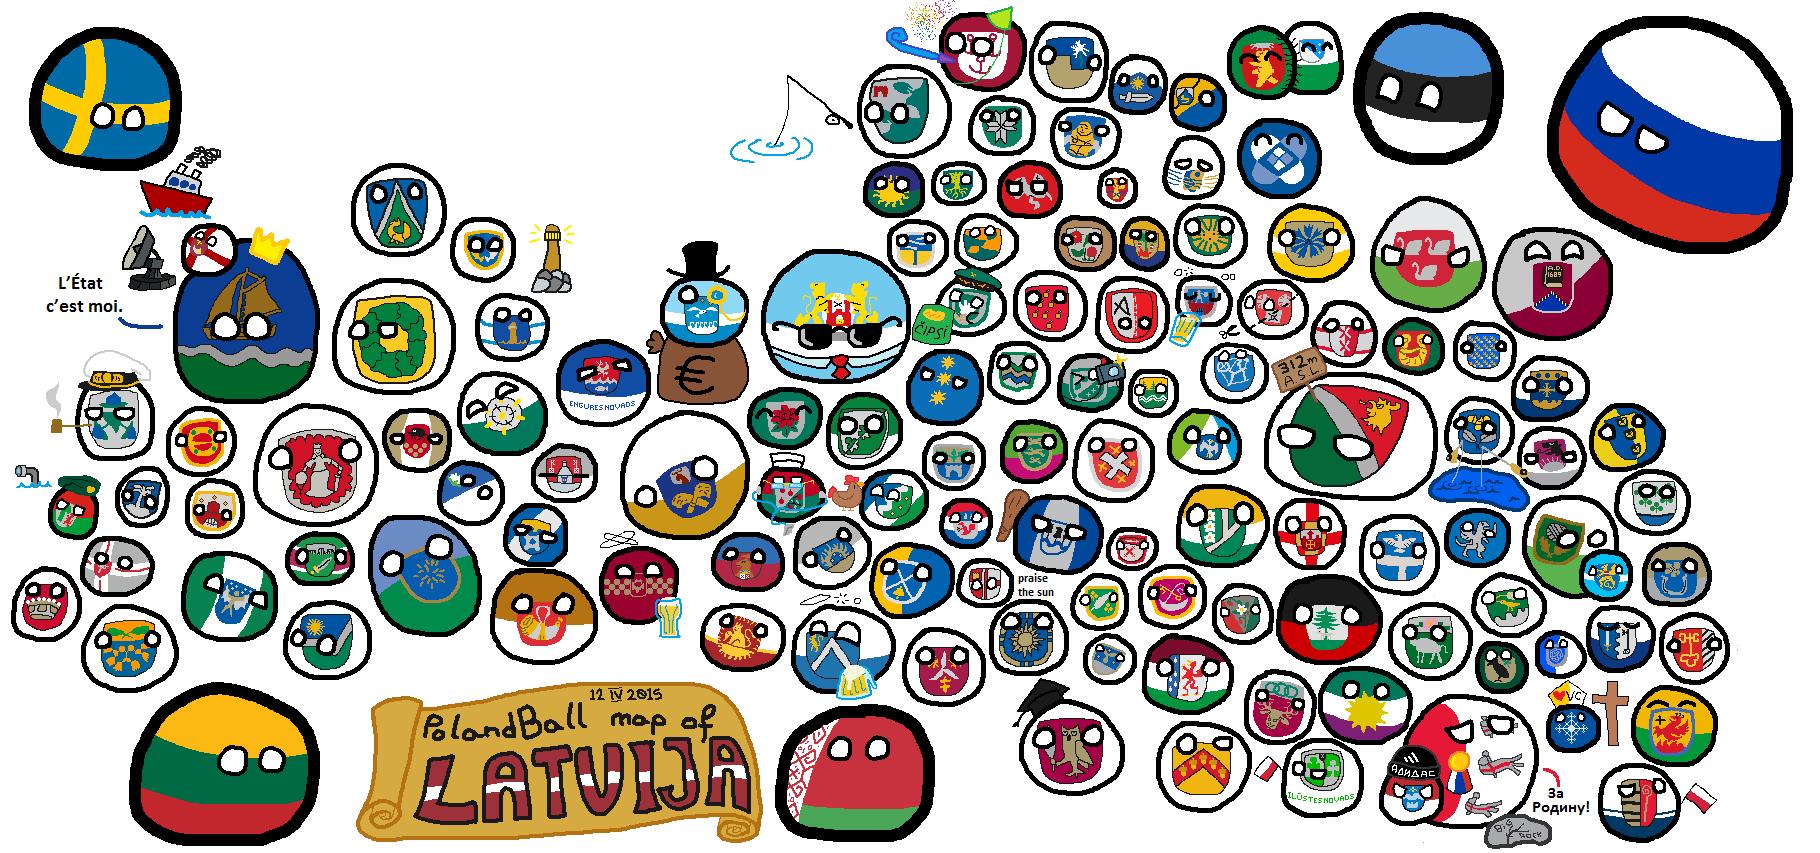 Image c71nlsag polandball wiki fandom powered by wikia c71nlsag gumiabroncs Choice Image